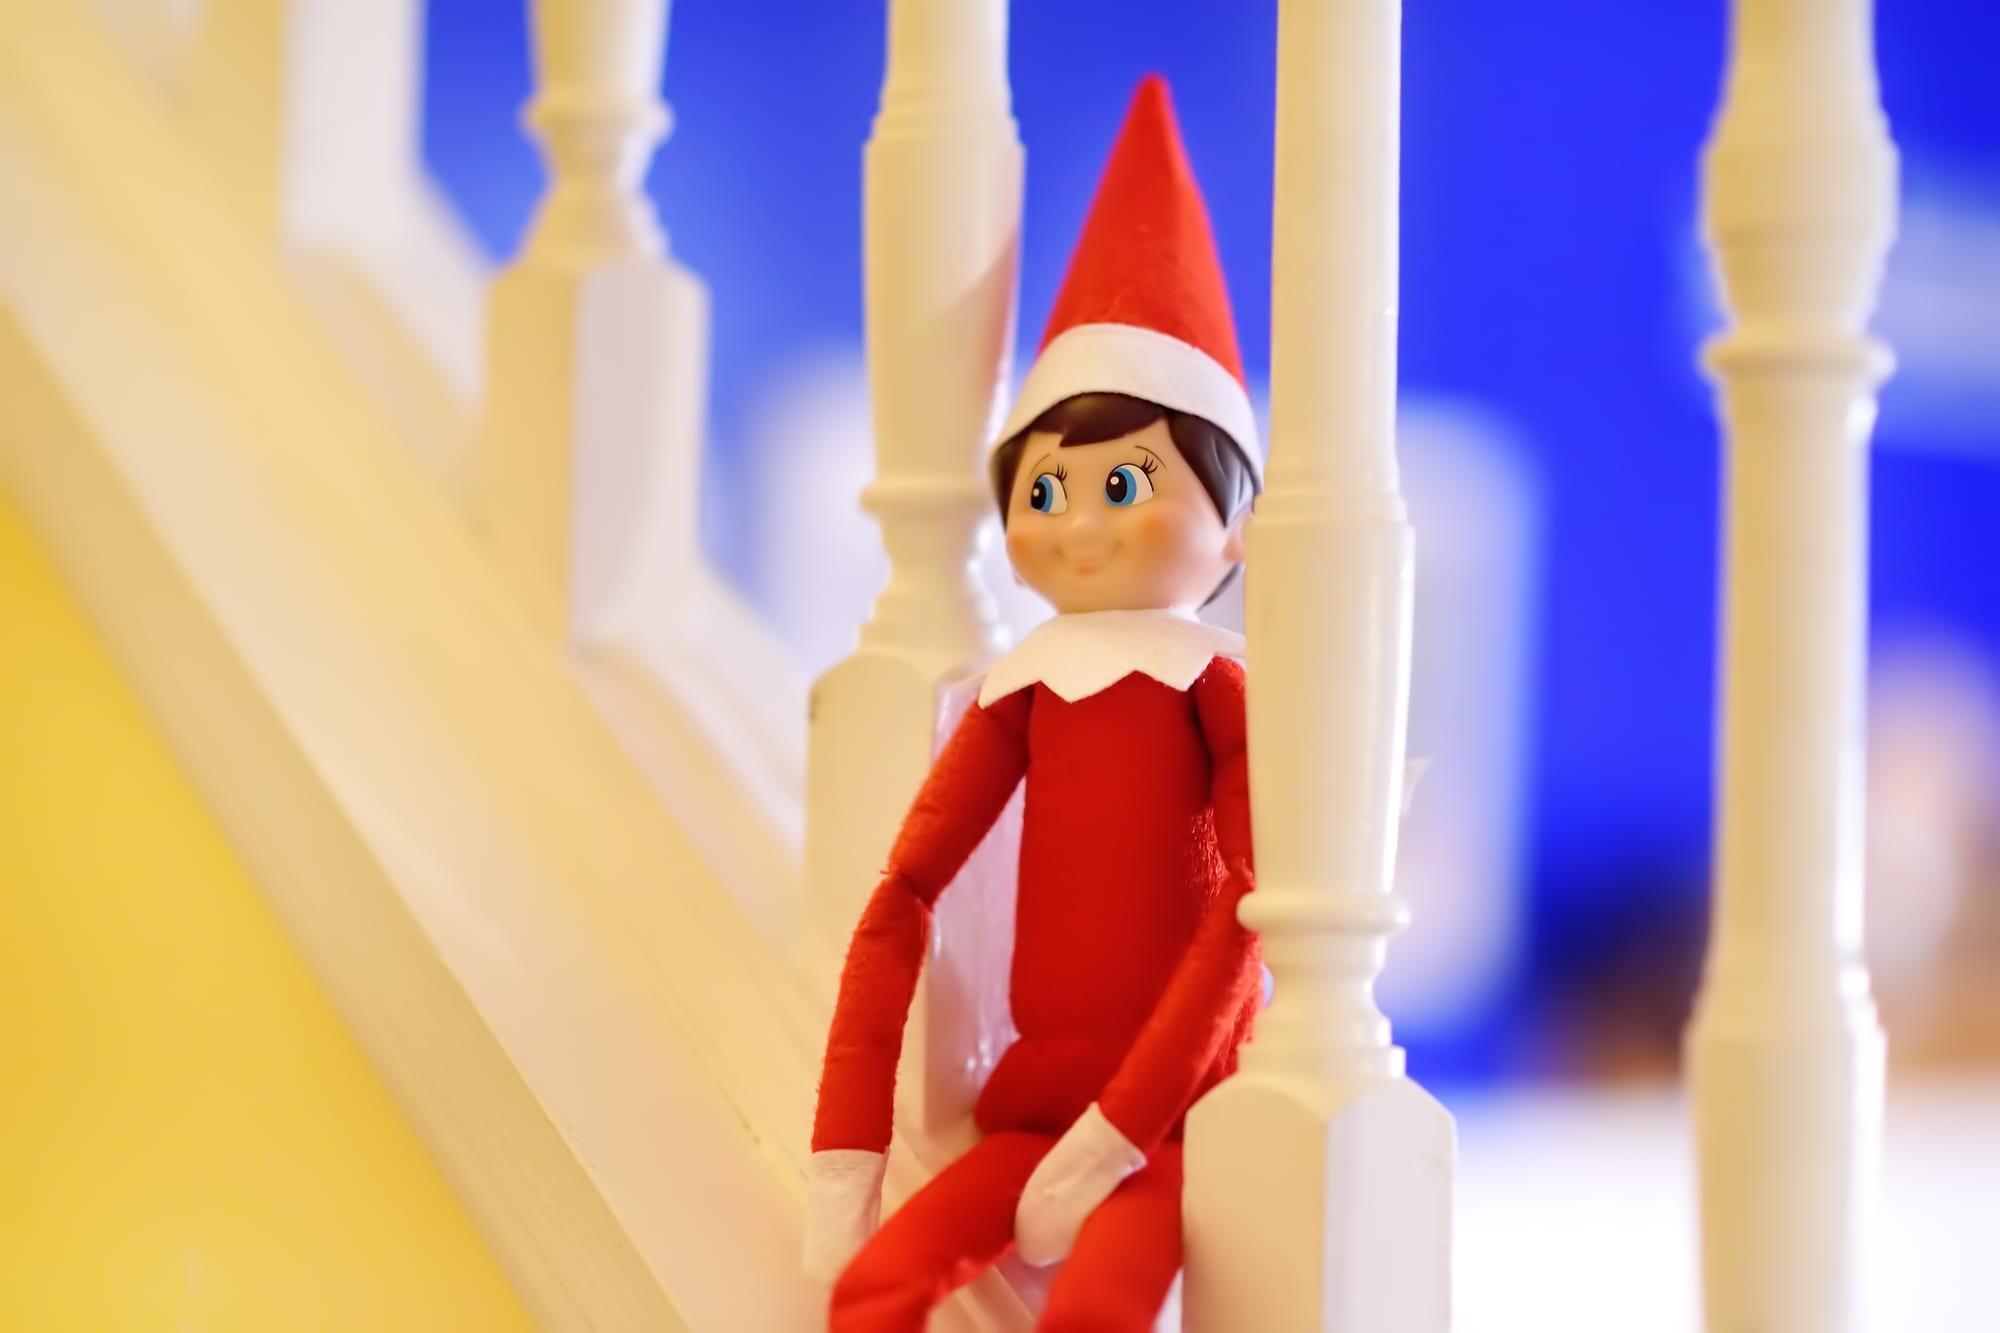 13 Elf On The Shelf Ideas And Printables